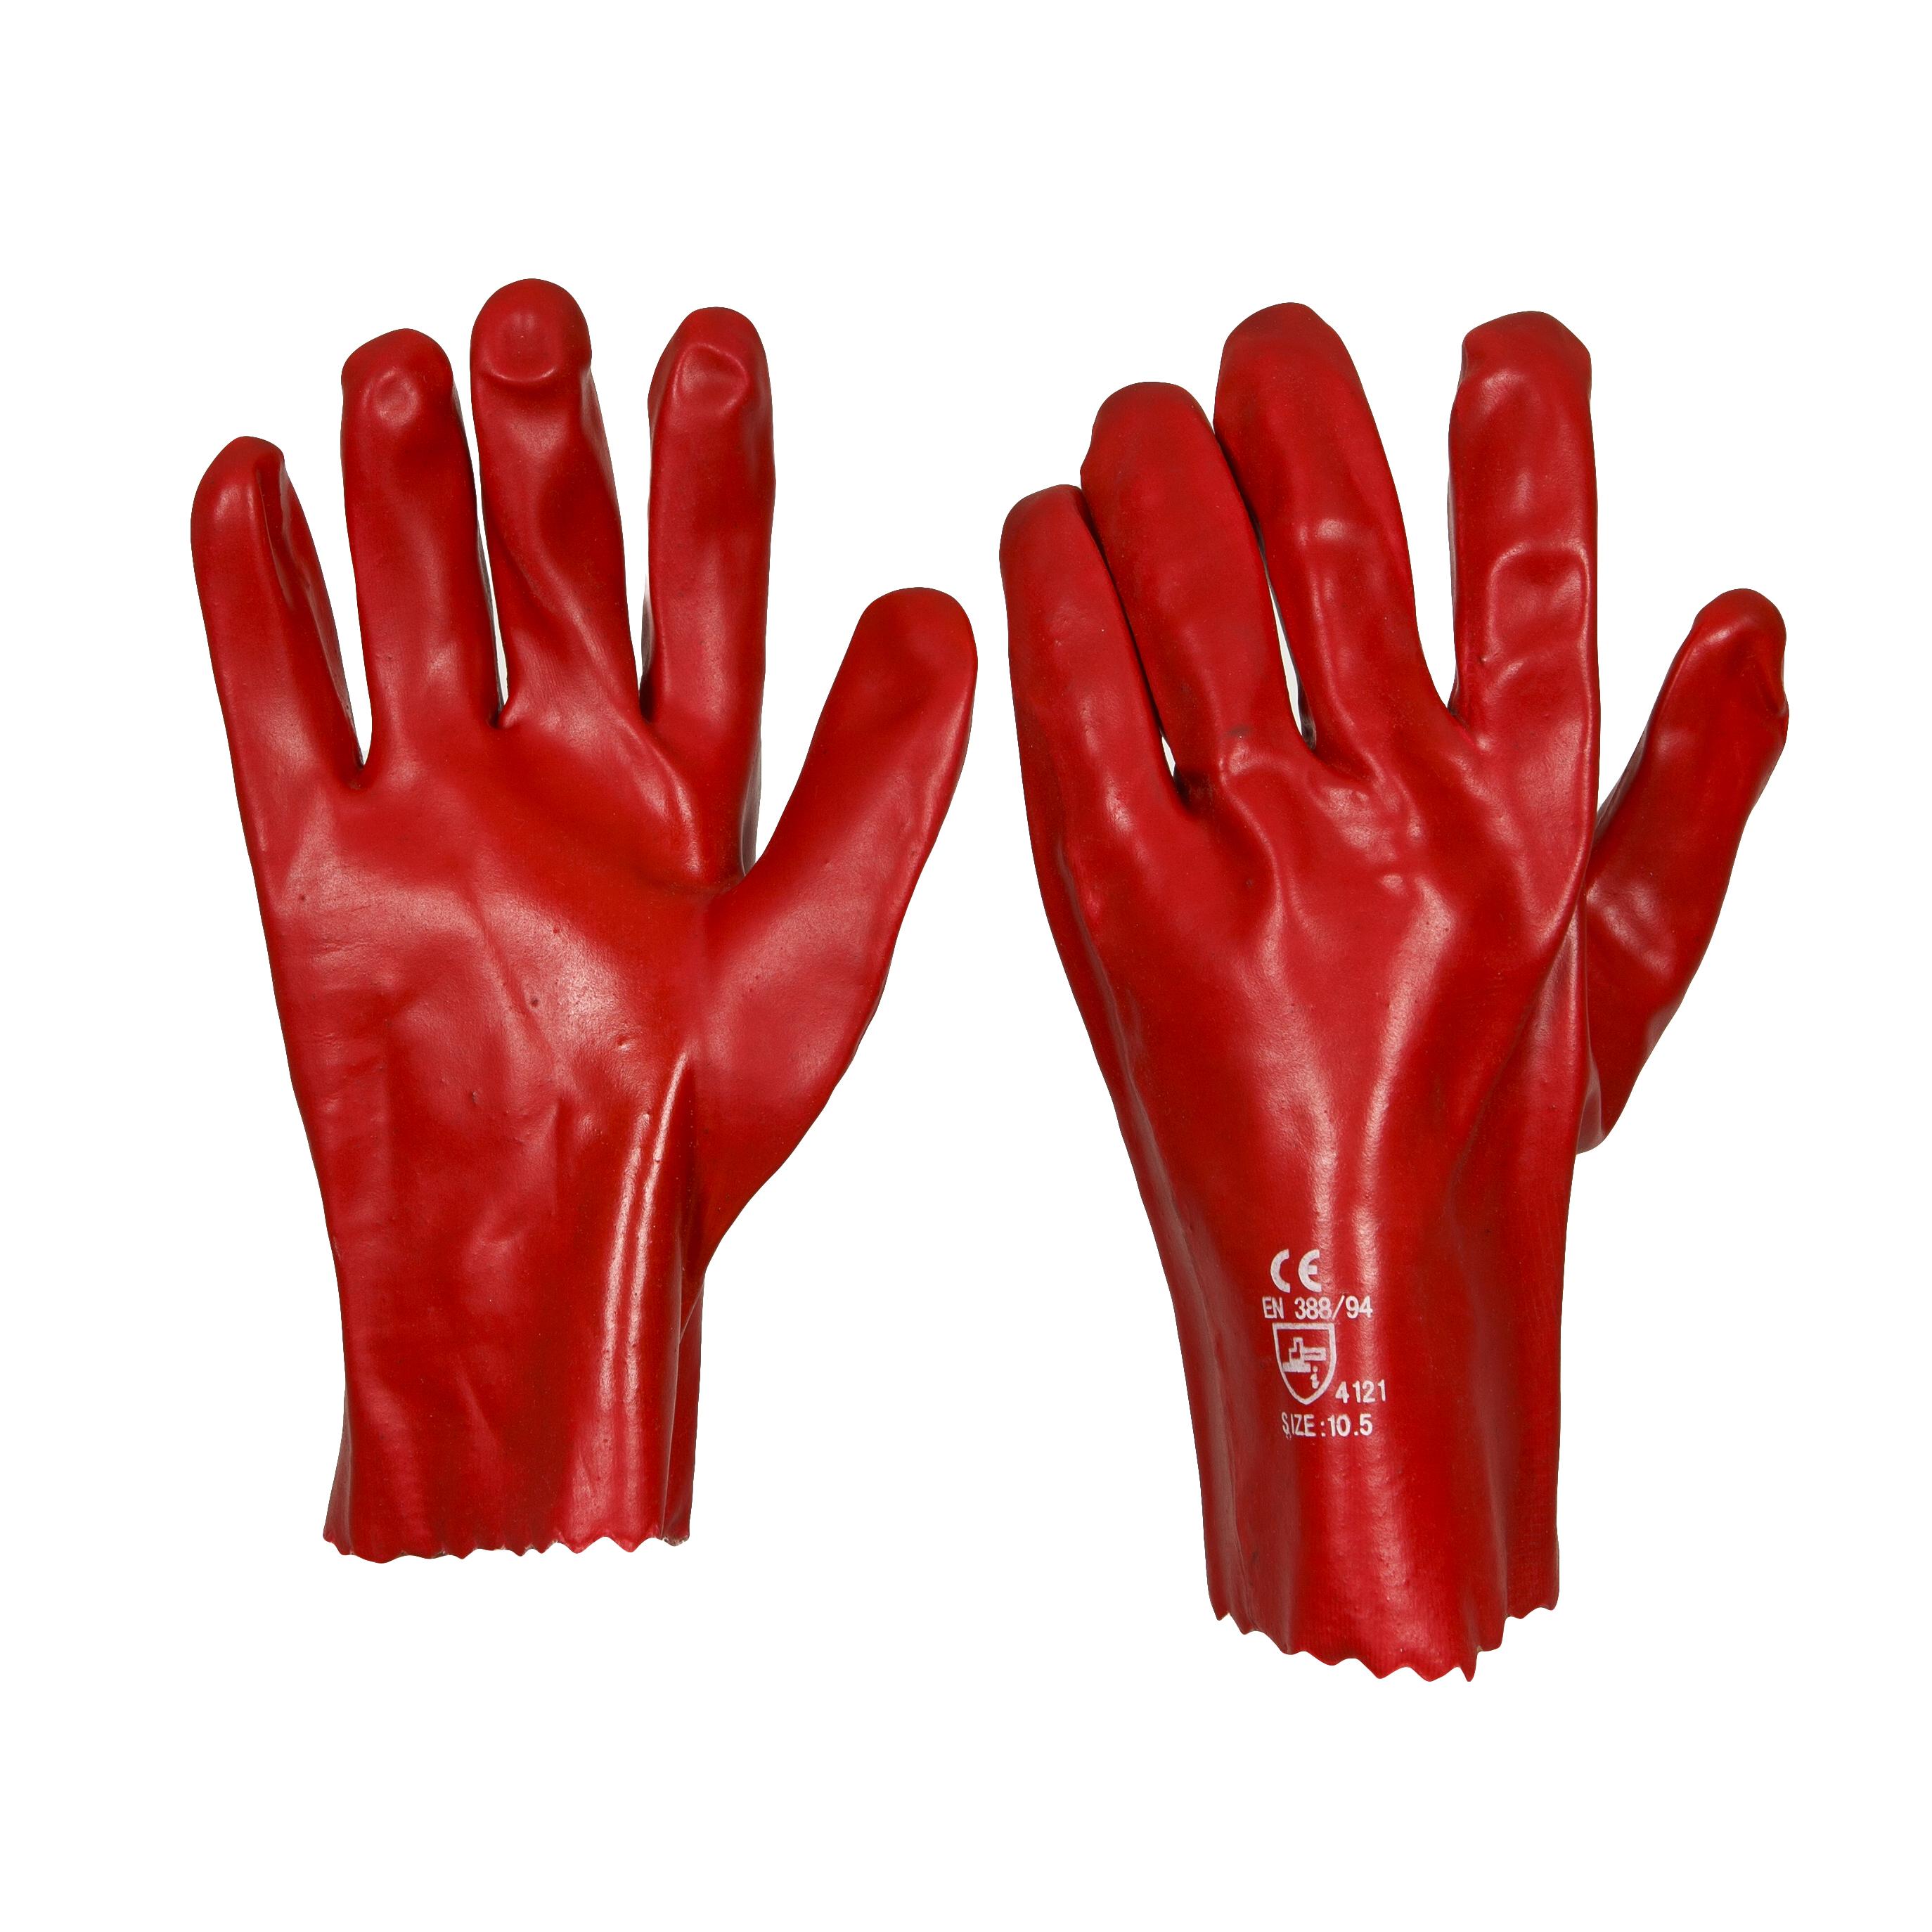 Hectoserve short PVC Gloves